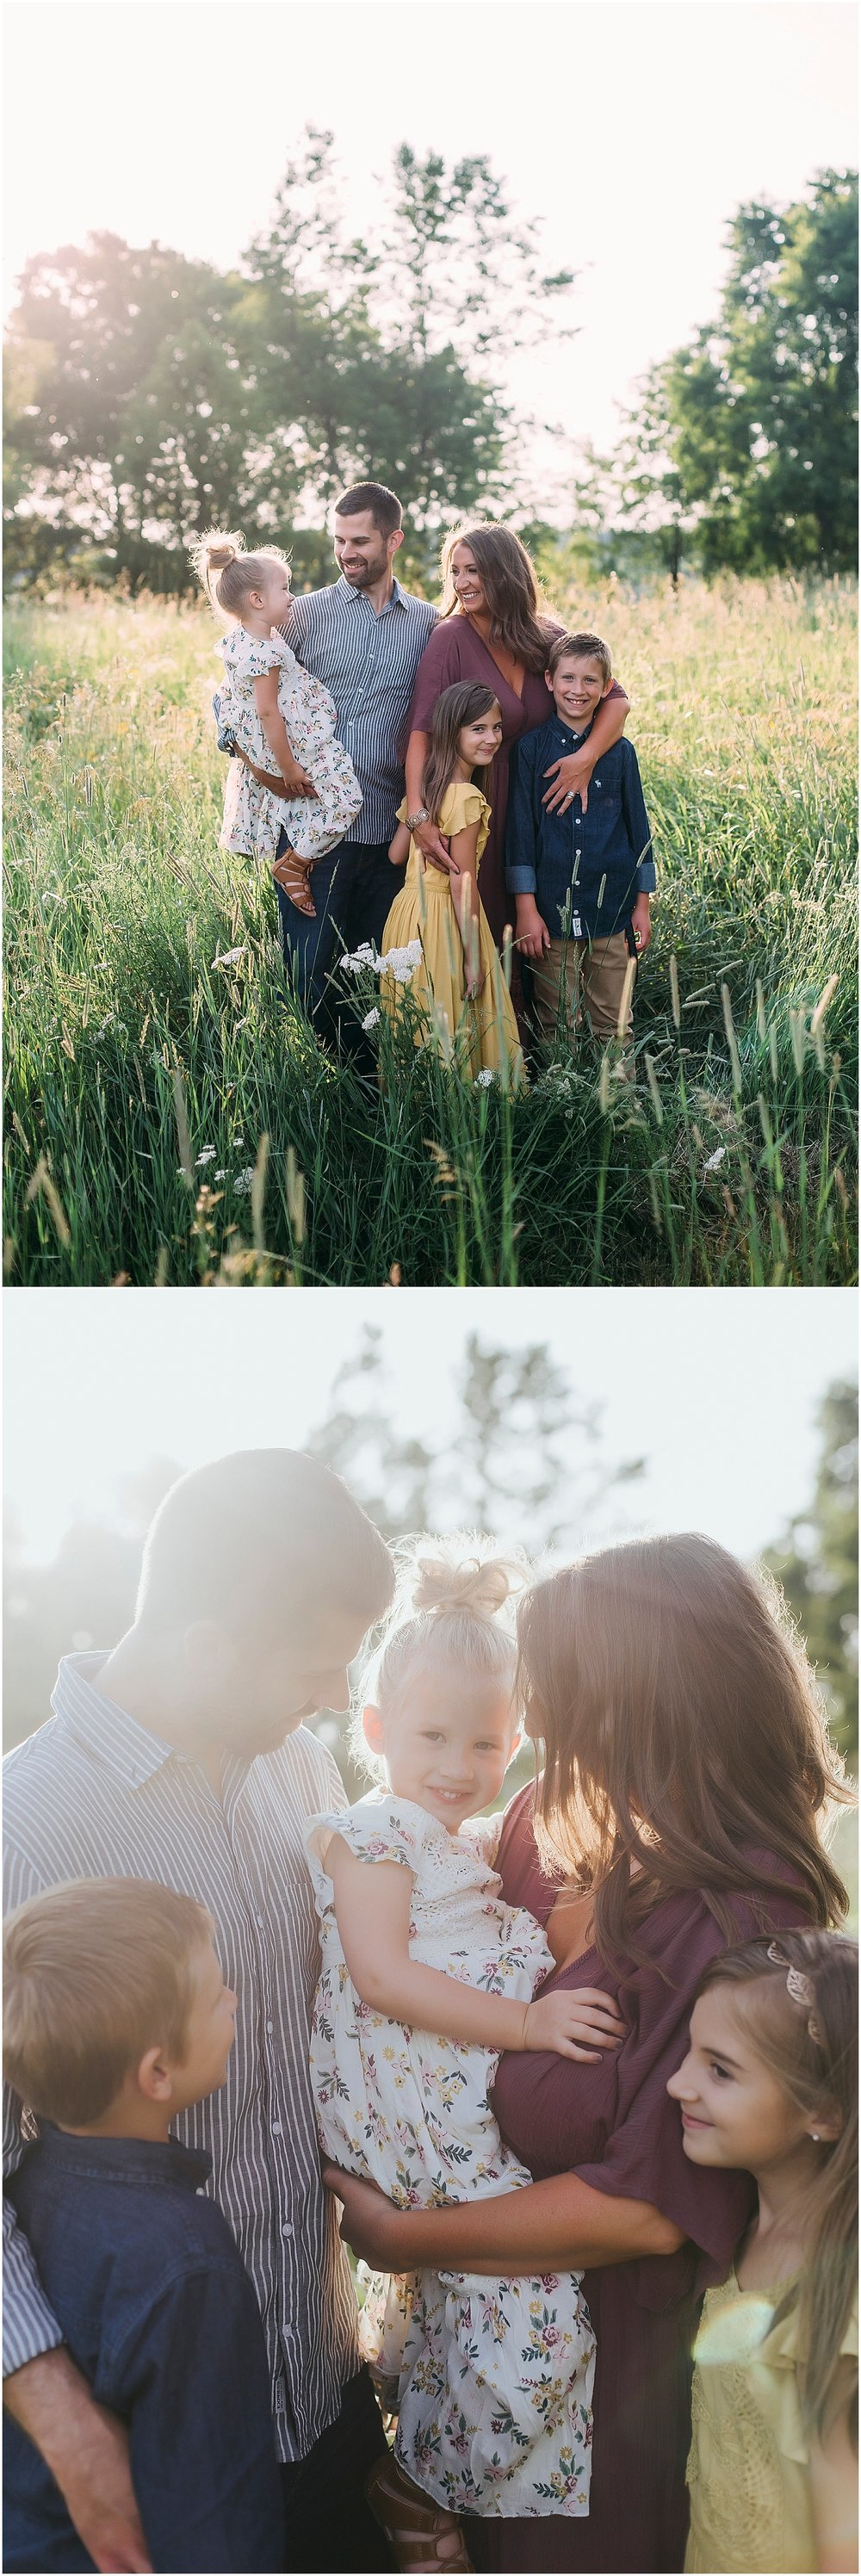 family of 5 photos in kalamazoo michigan